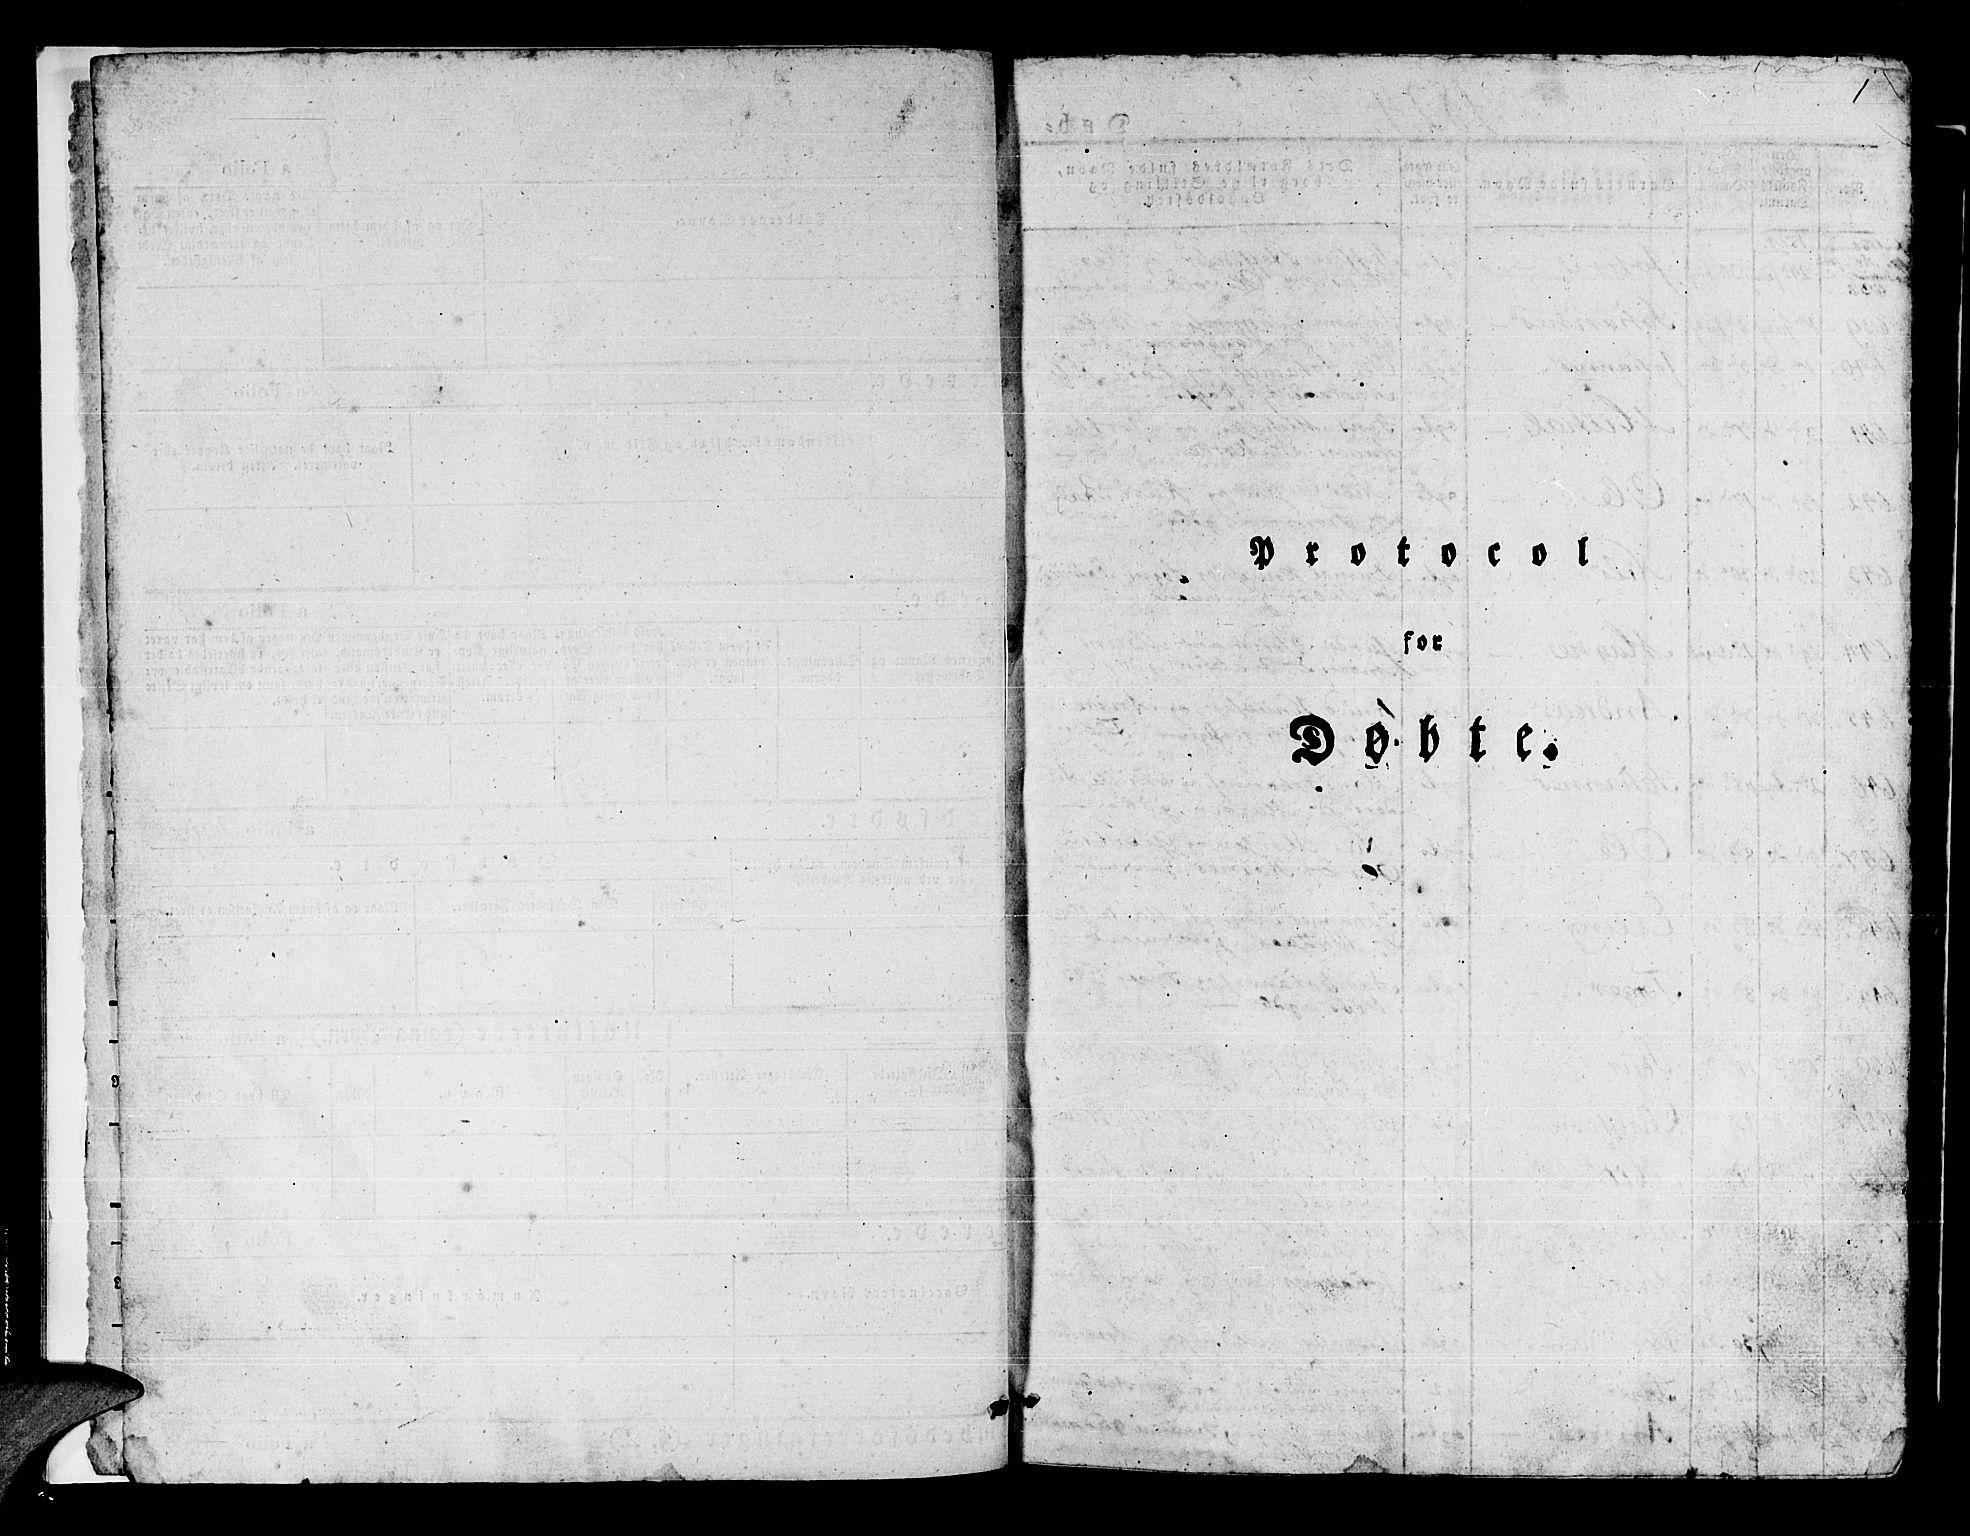 SAB, Manger sokneprestembete, H/Haa: Ministerialbok nr. A 4, 1824-1838, s. 1